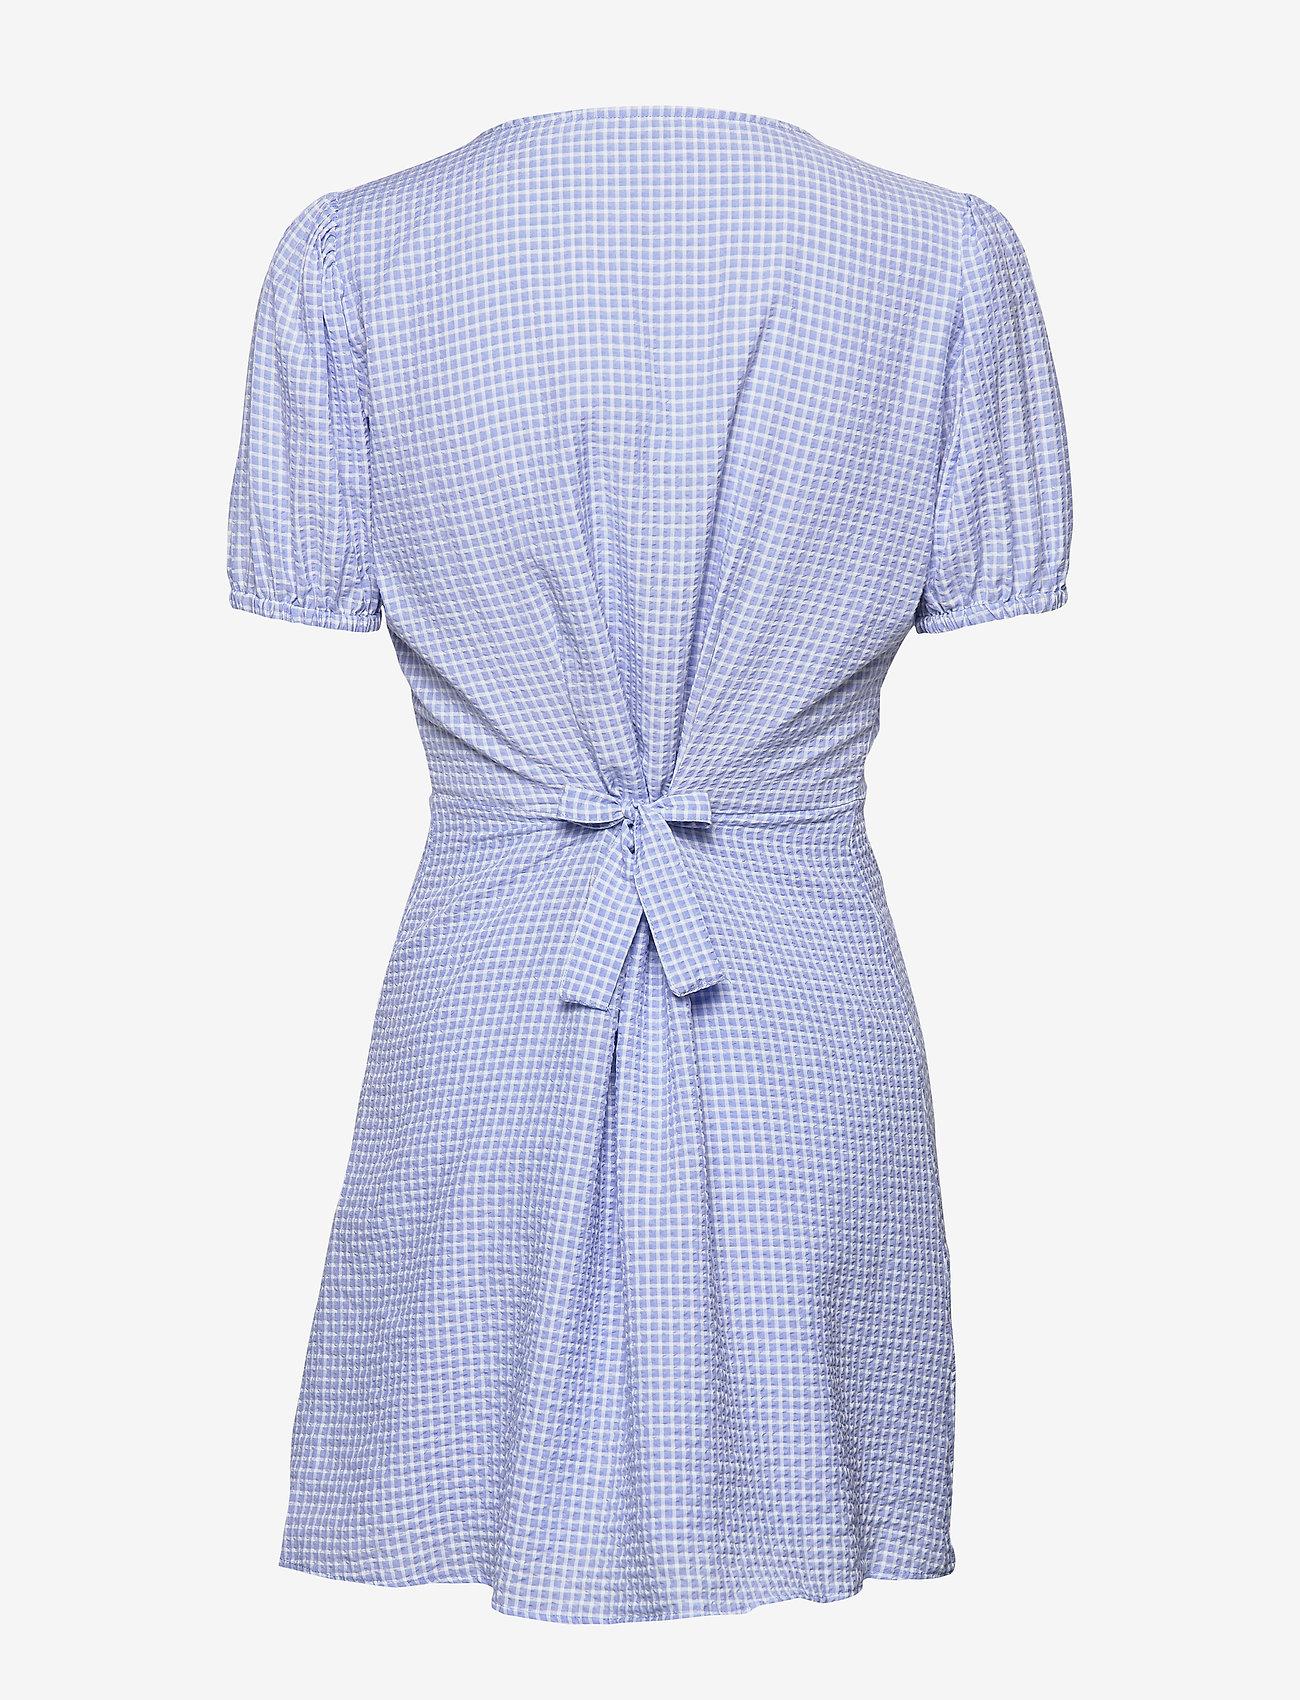 Encitrus Ss Dress 6680 (Lavender Check) (420 kr) - Envii